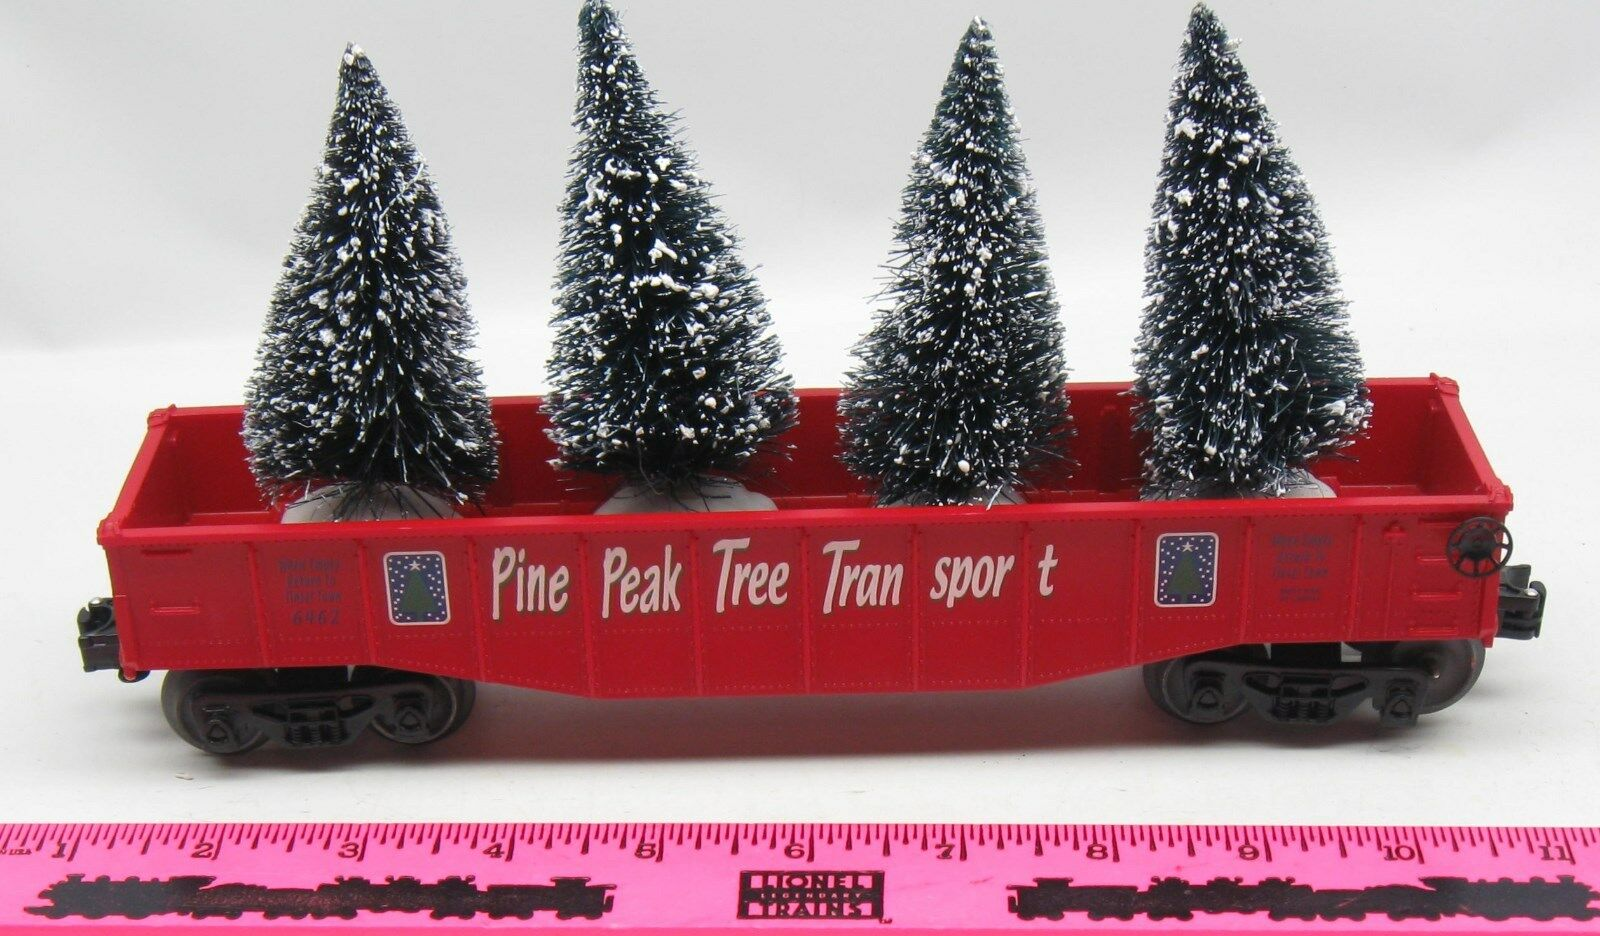 Lionel 6462 Pine Peak Tree Transport gondola with trees